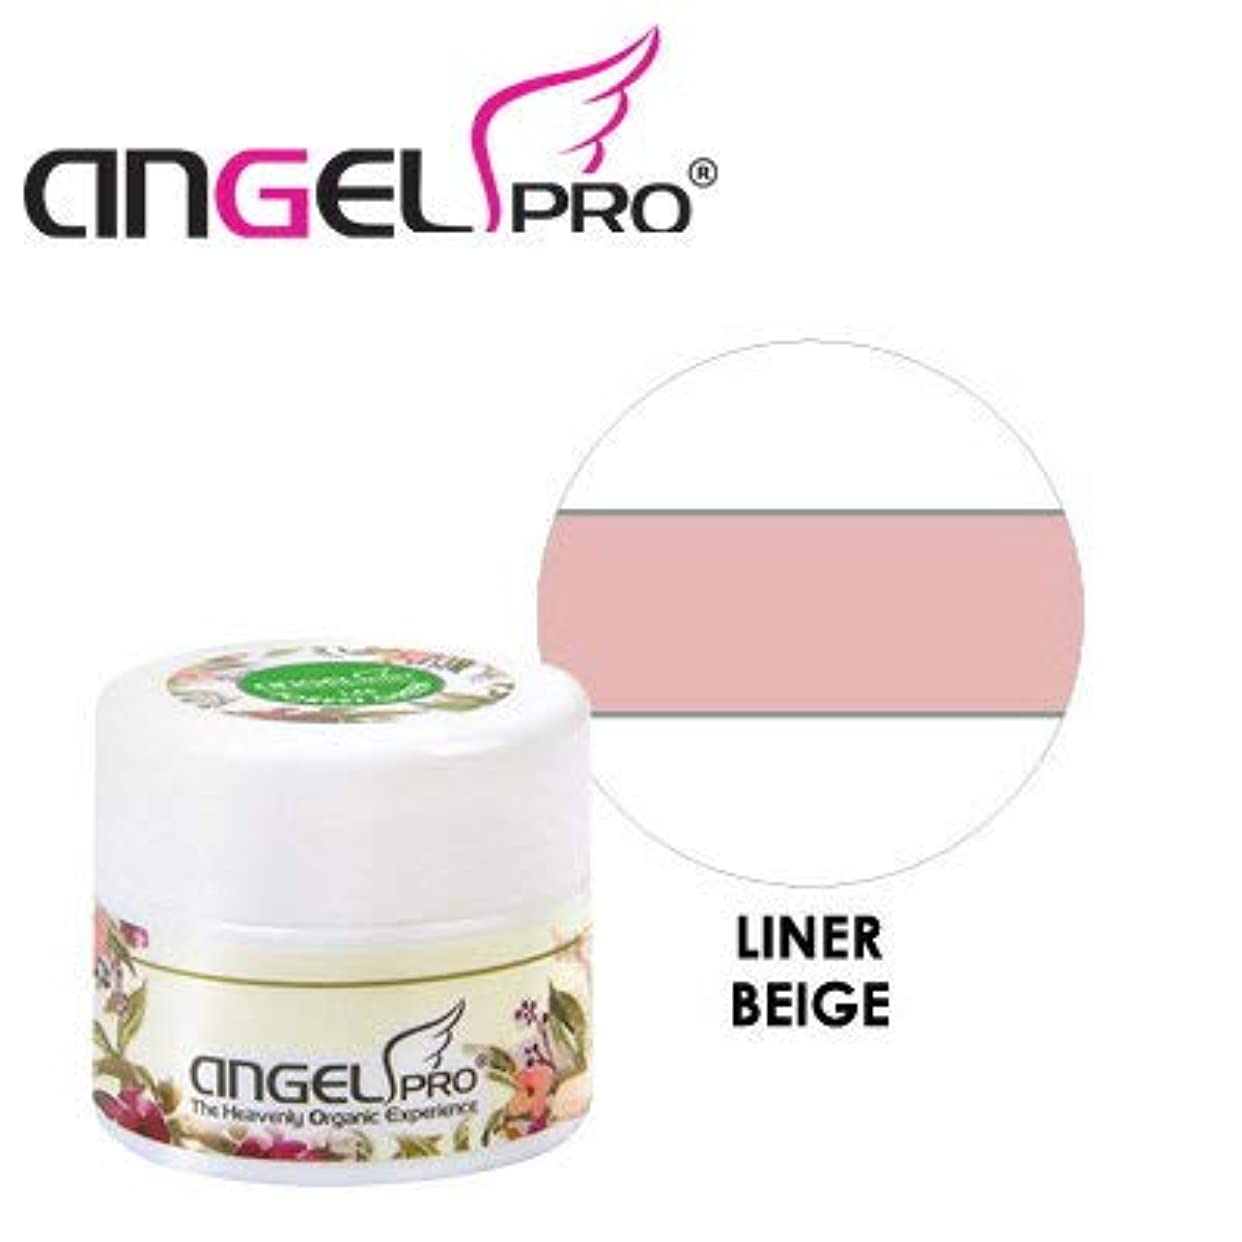 ANGEL PRO ポットジェリー LINER BEIGE 4g